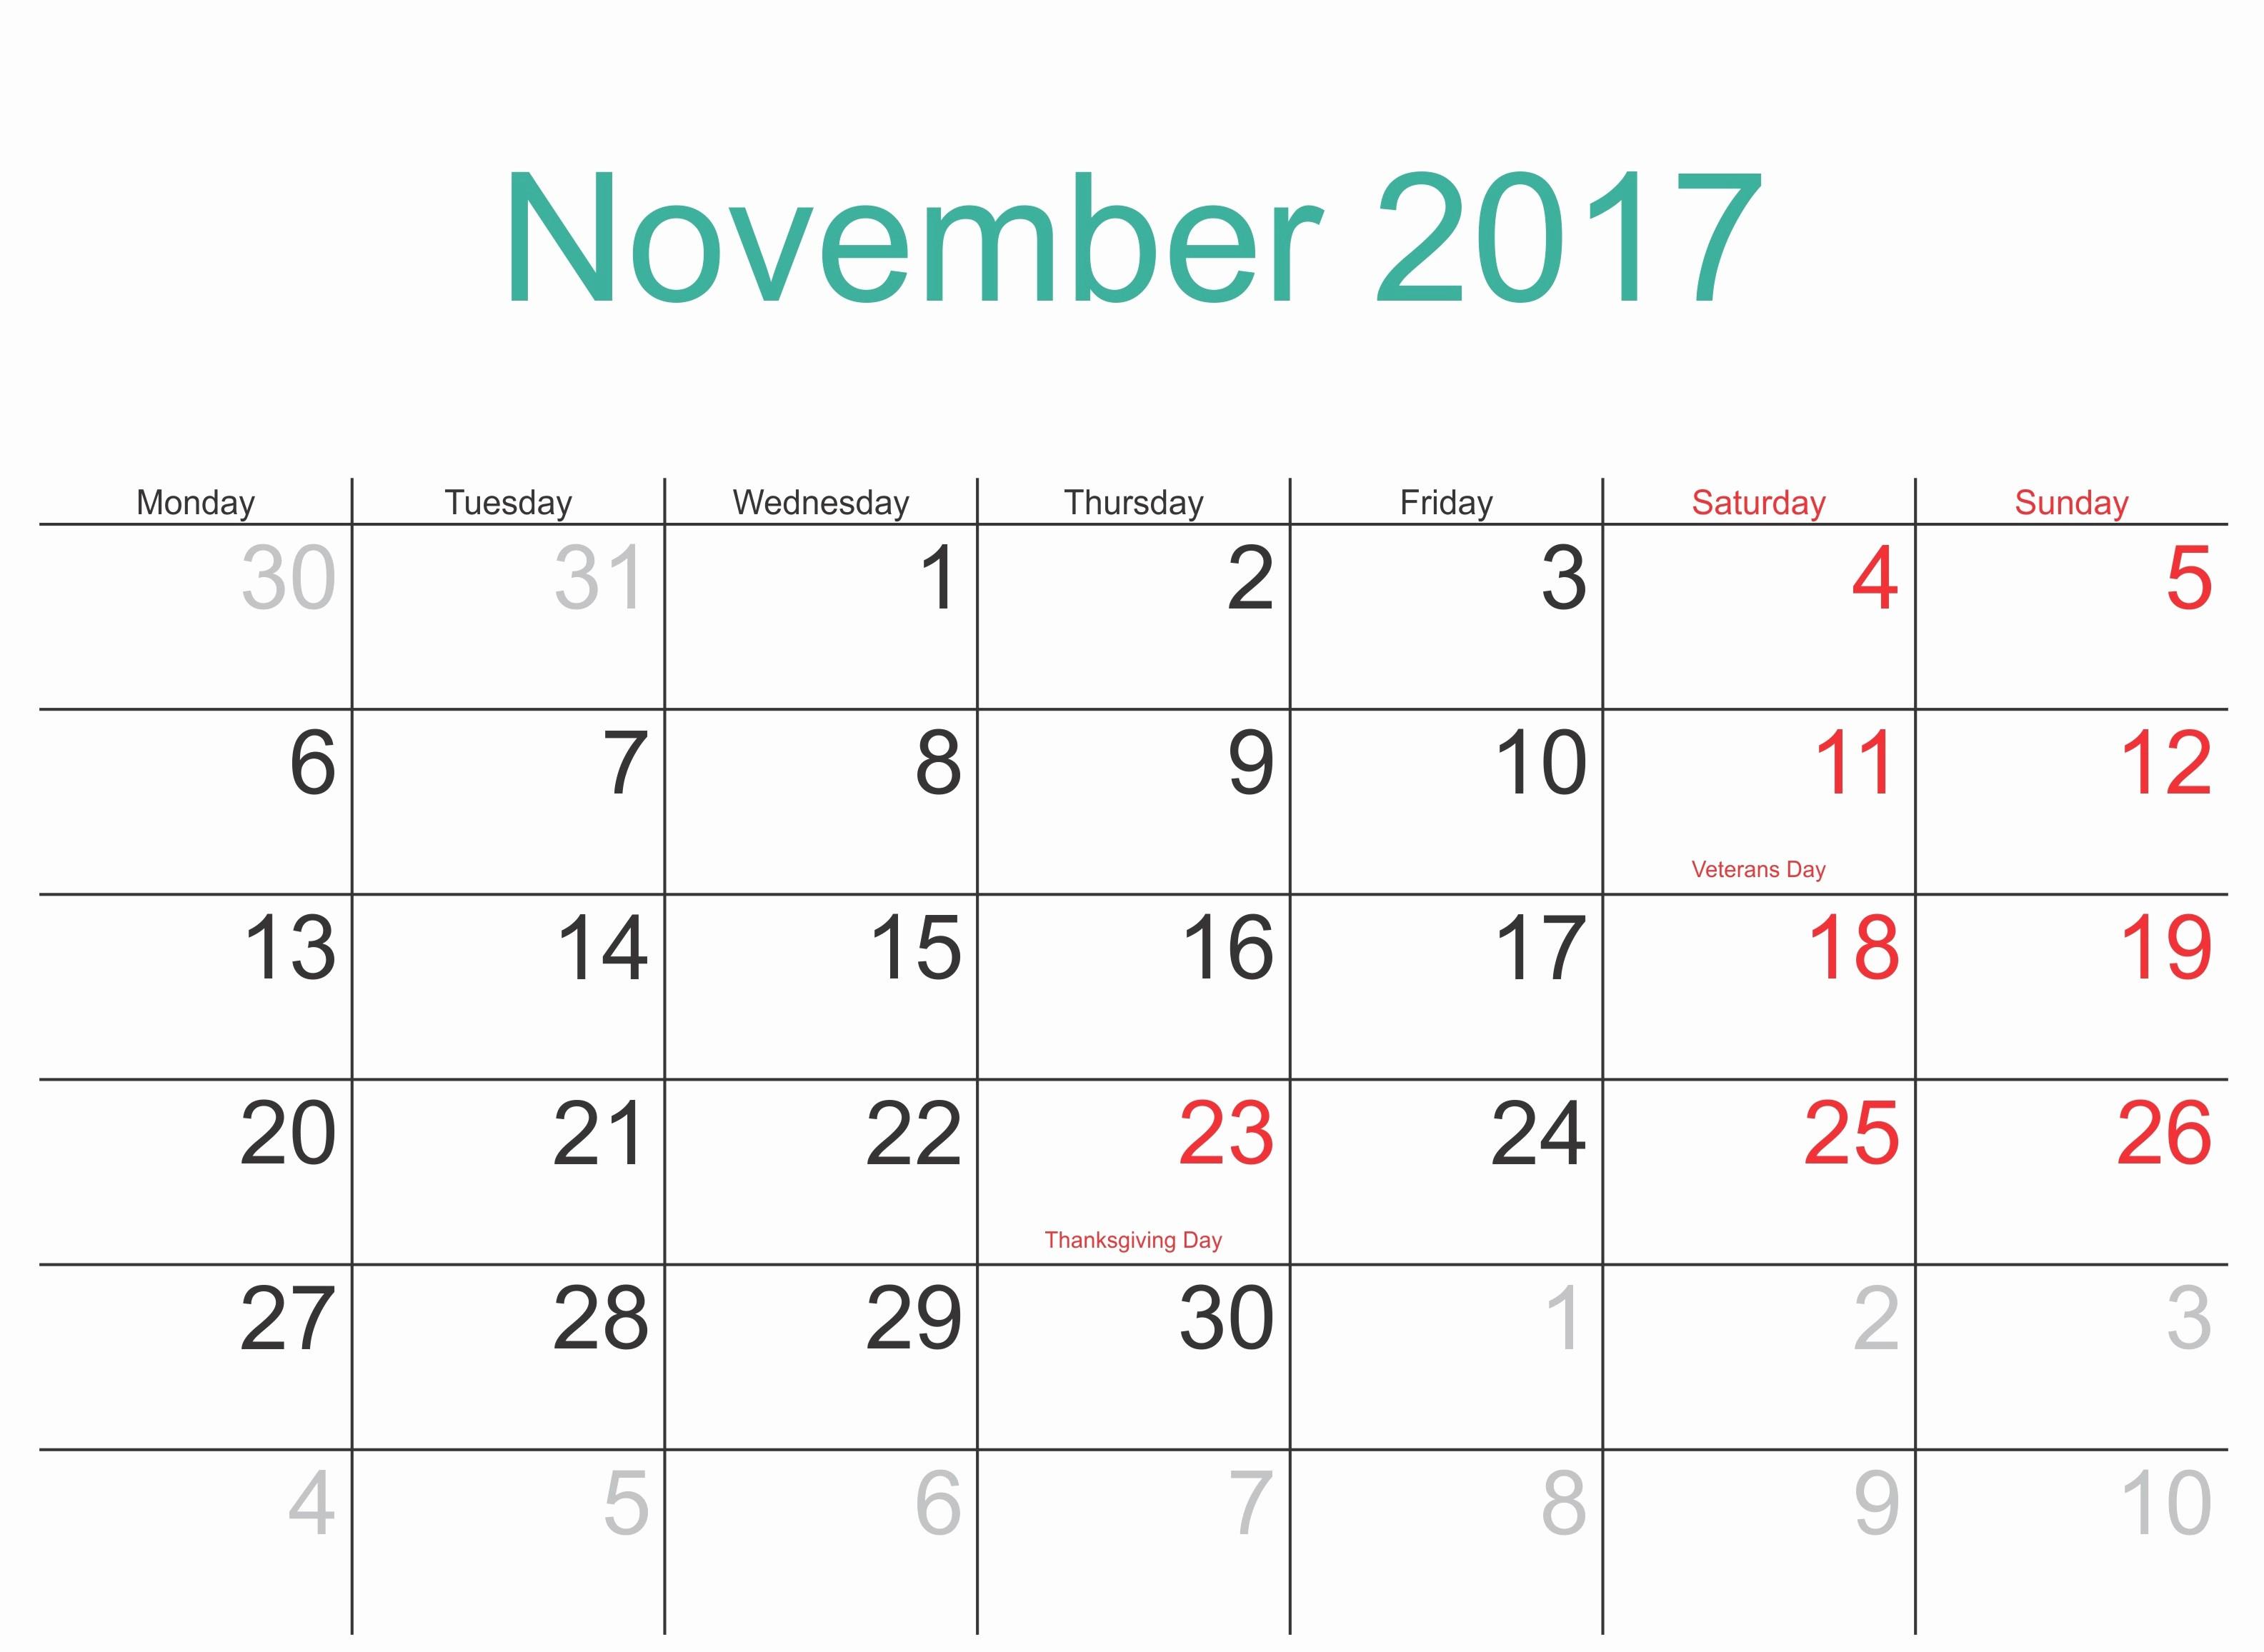 Free 2017 Printable Calendar Word Beautiful November 2017 Printable Calendar Template Holidays Excel